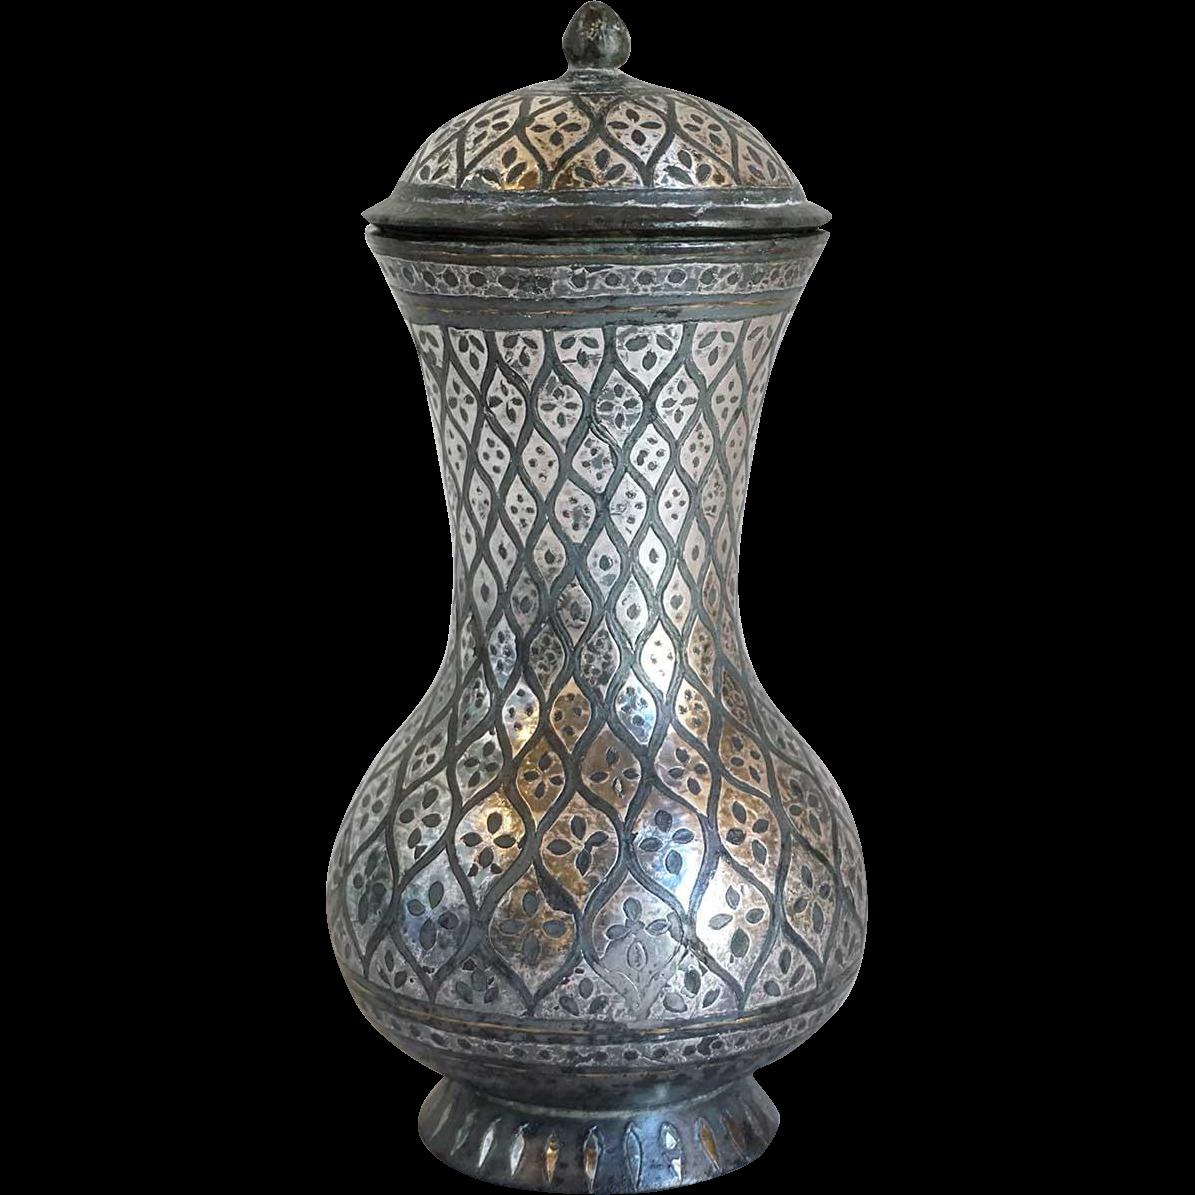 Indian Mughal Silver Inlaid Bidri Baluster Lidded Jar